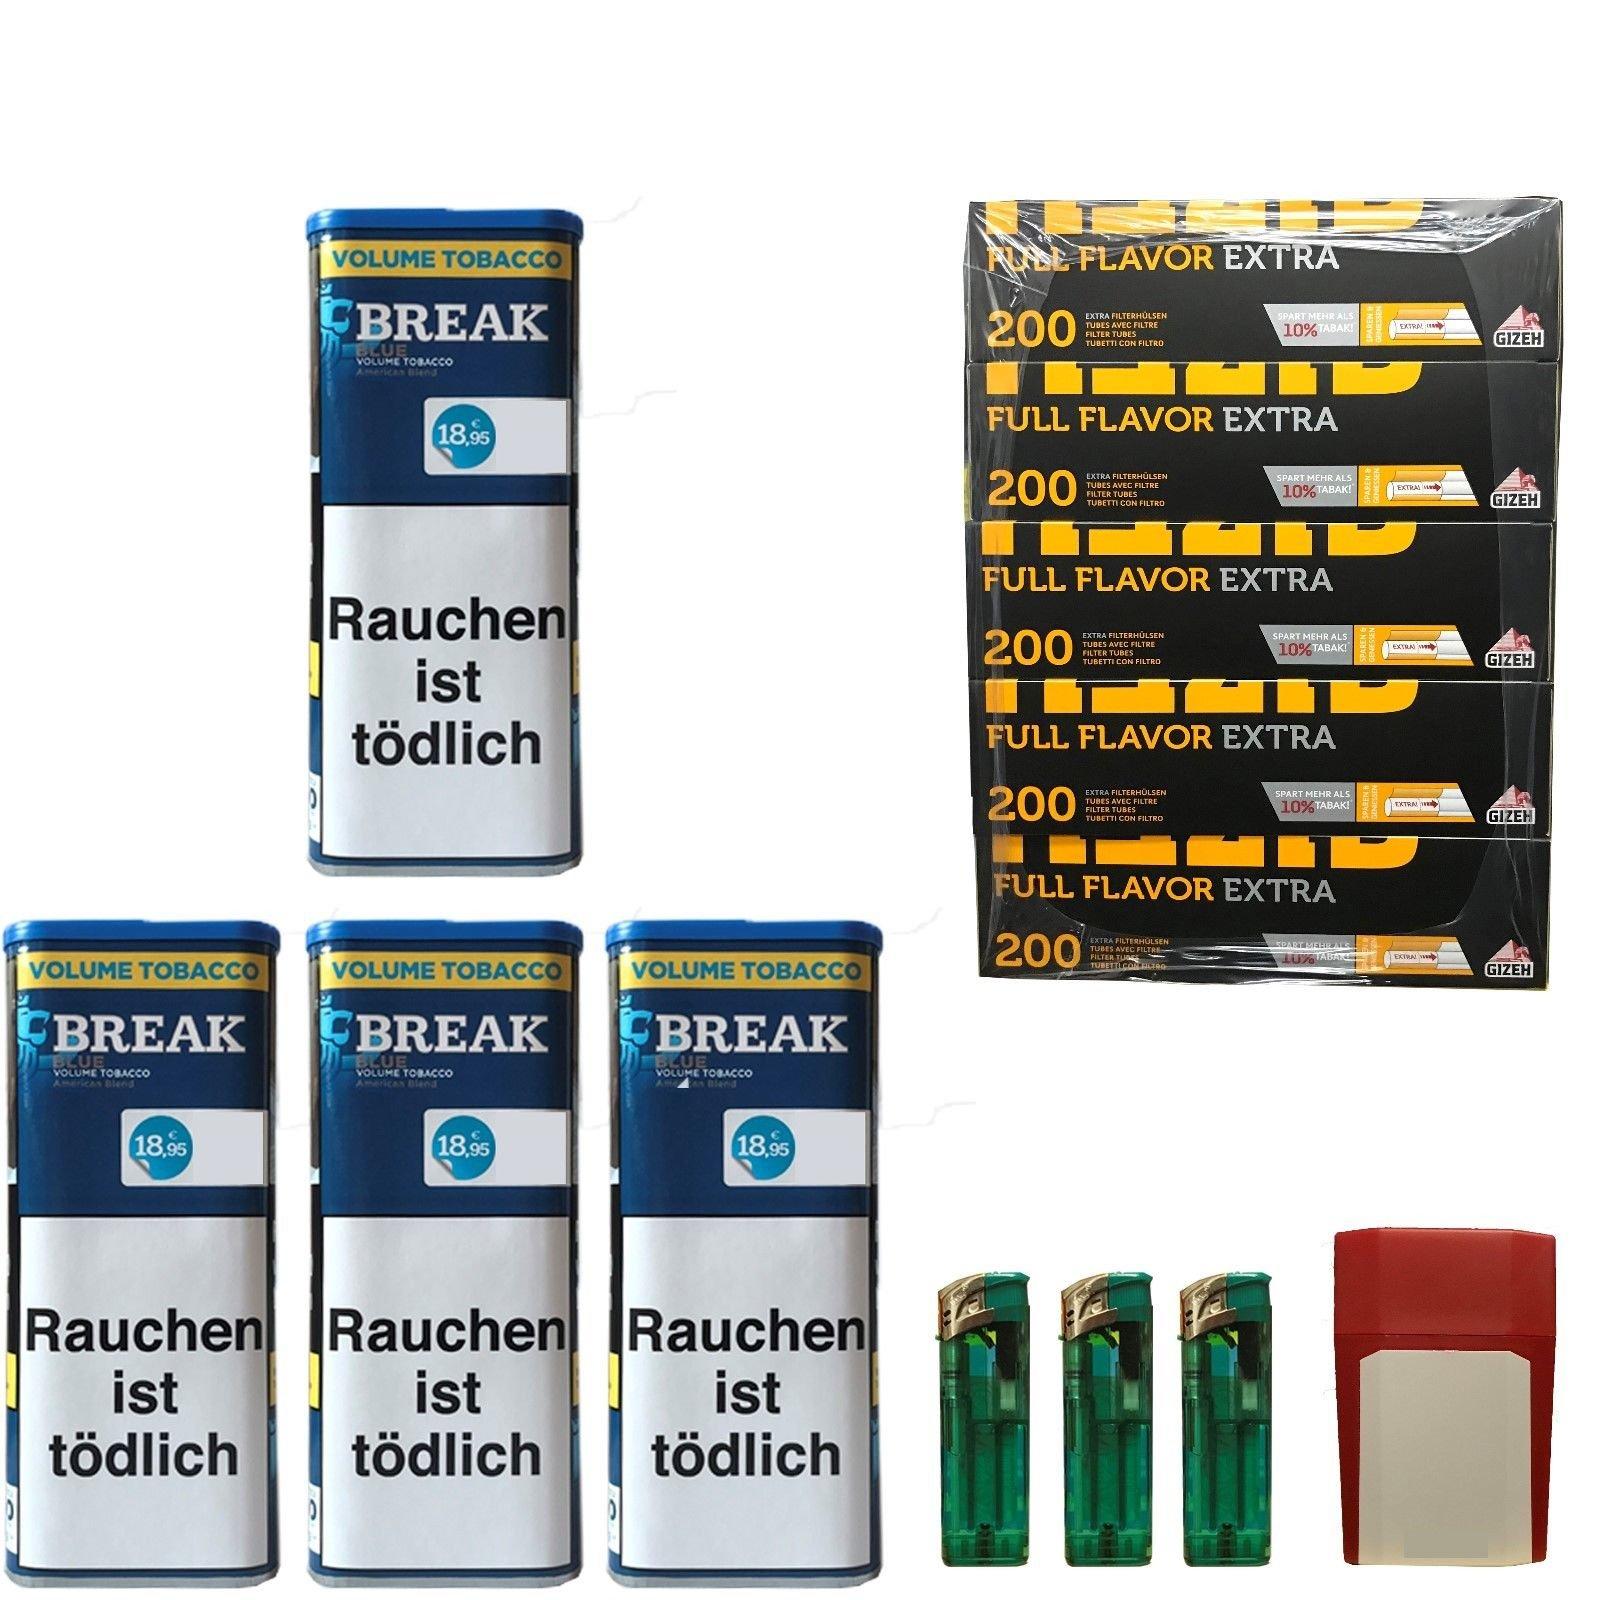 4x Break Blue/Blau XXL Volumentabak 120g, Full Flavor Extra Hülsen, Feuerz., Box